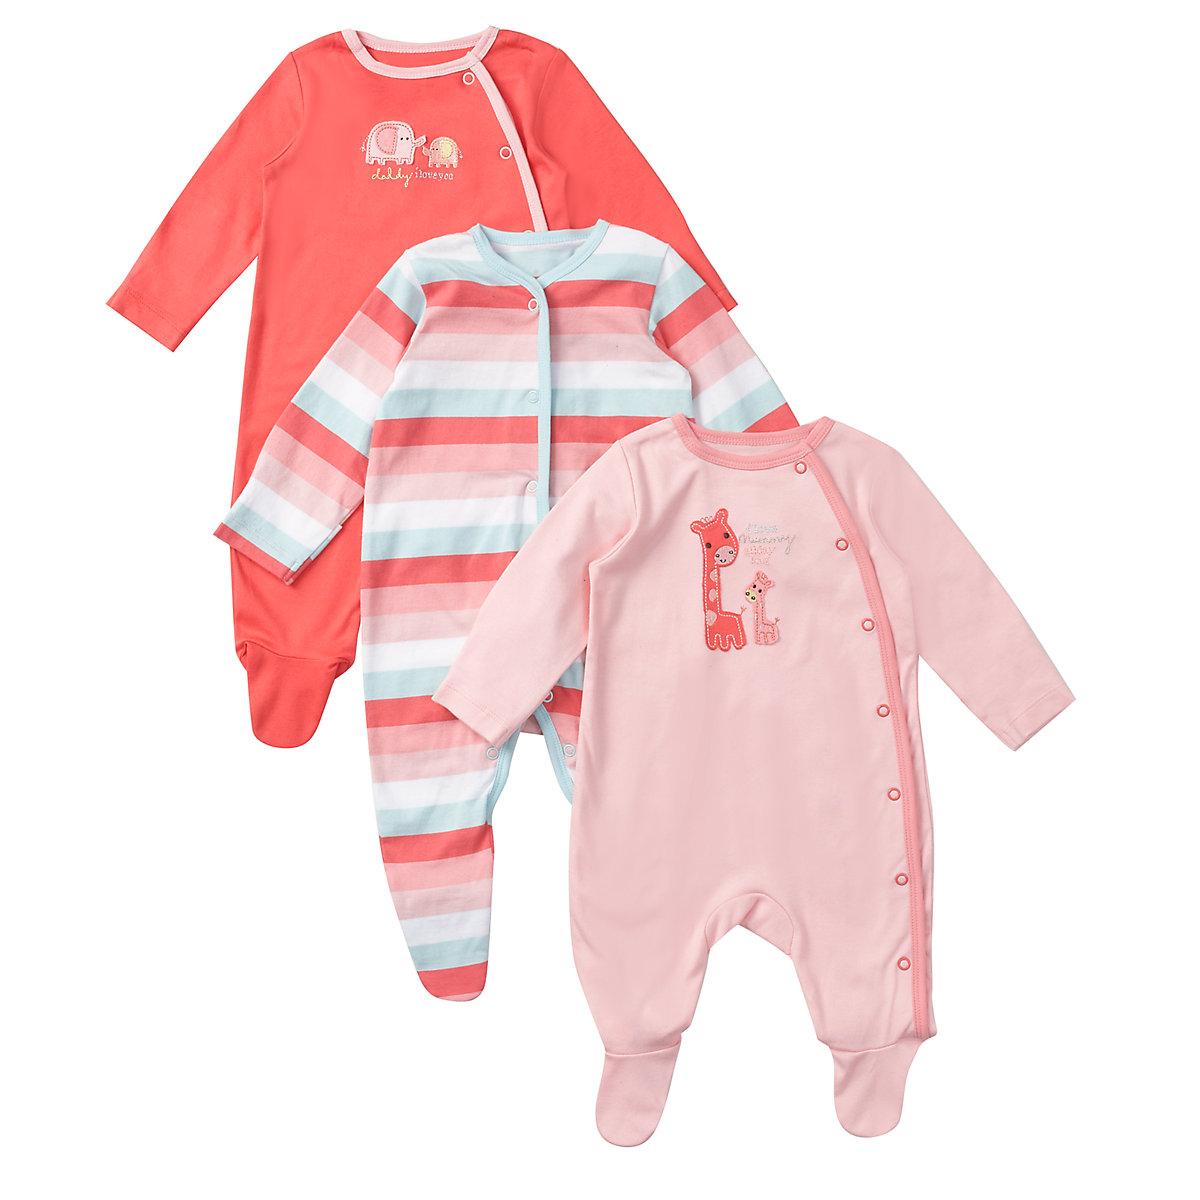 Mothercare Newborns Mummy & Daddy Sleepsuit – 3 Pack Size